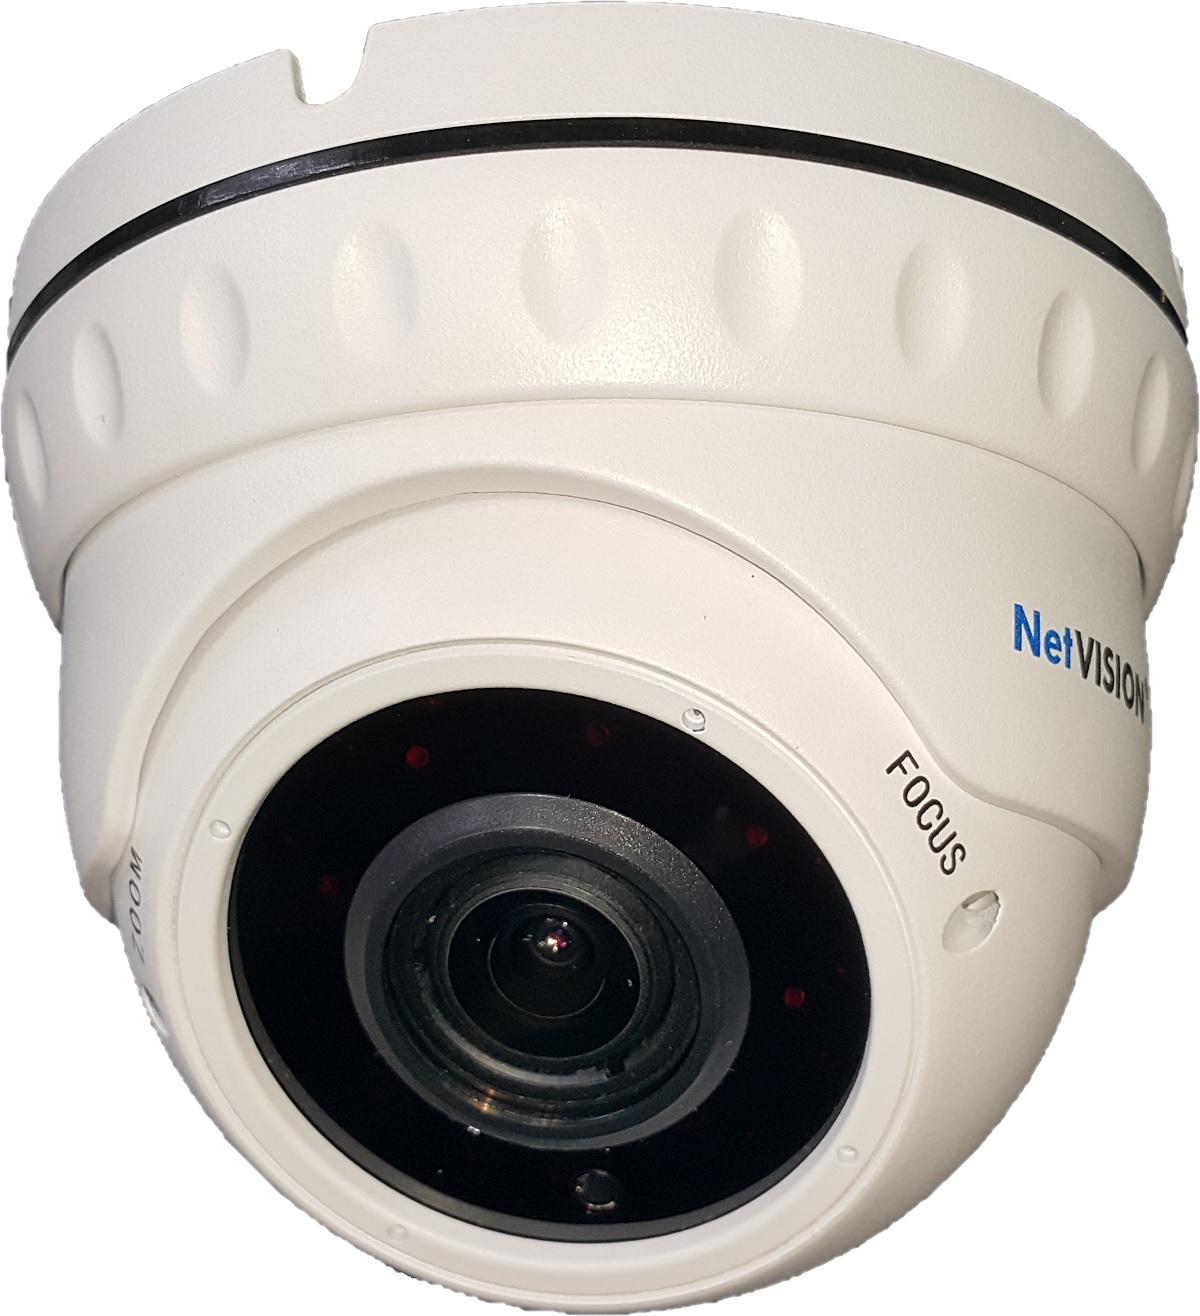 Netvision HD 4in1 2.8-12mm Manuel Zoom Progressive Kamera